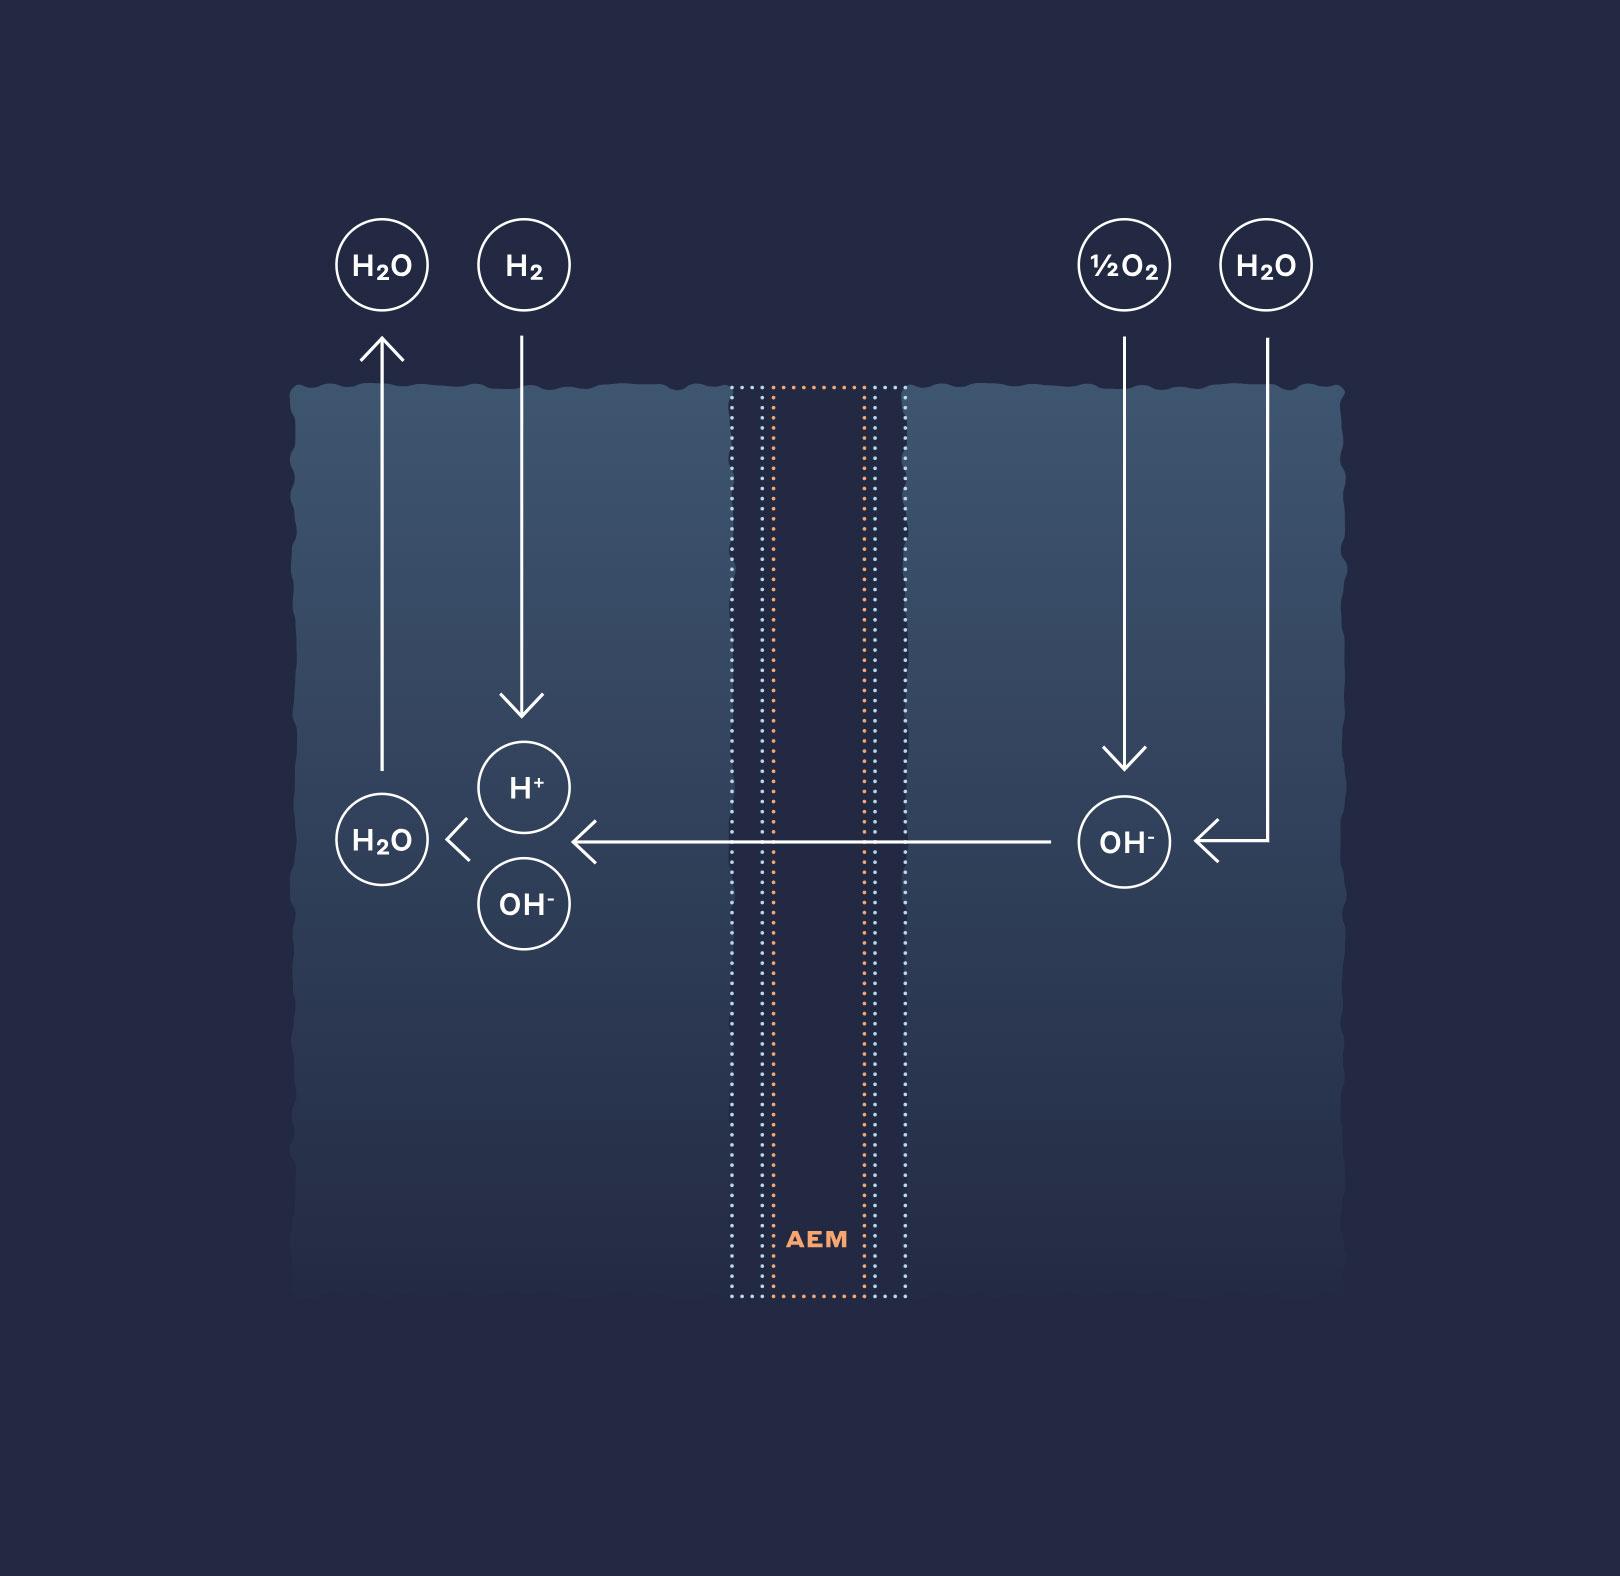 AEM Fuel Cells (AEMFC) Membranes & Ionomer | Ionomr Innovations Inc